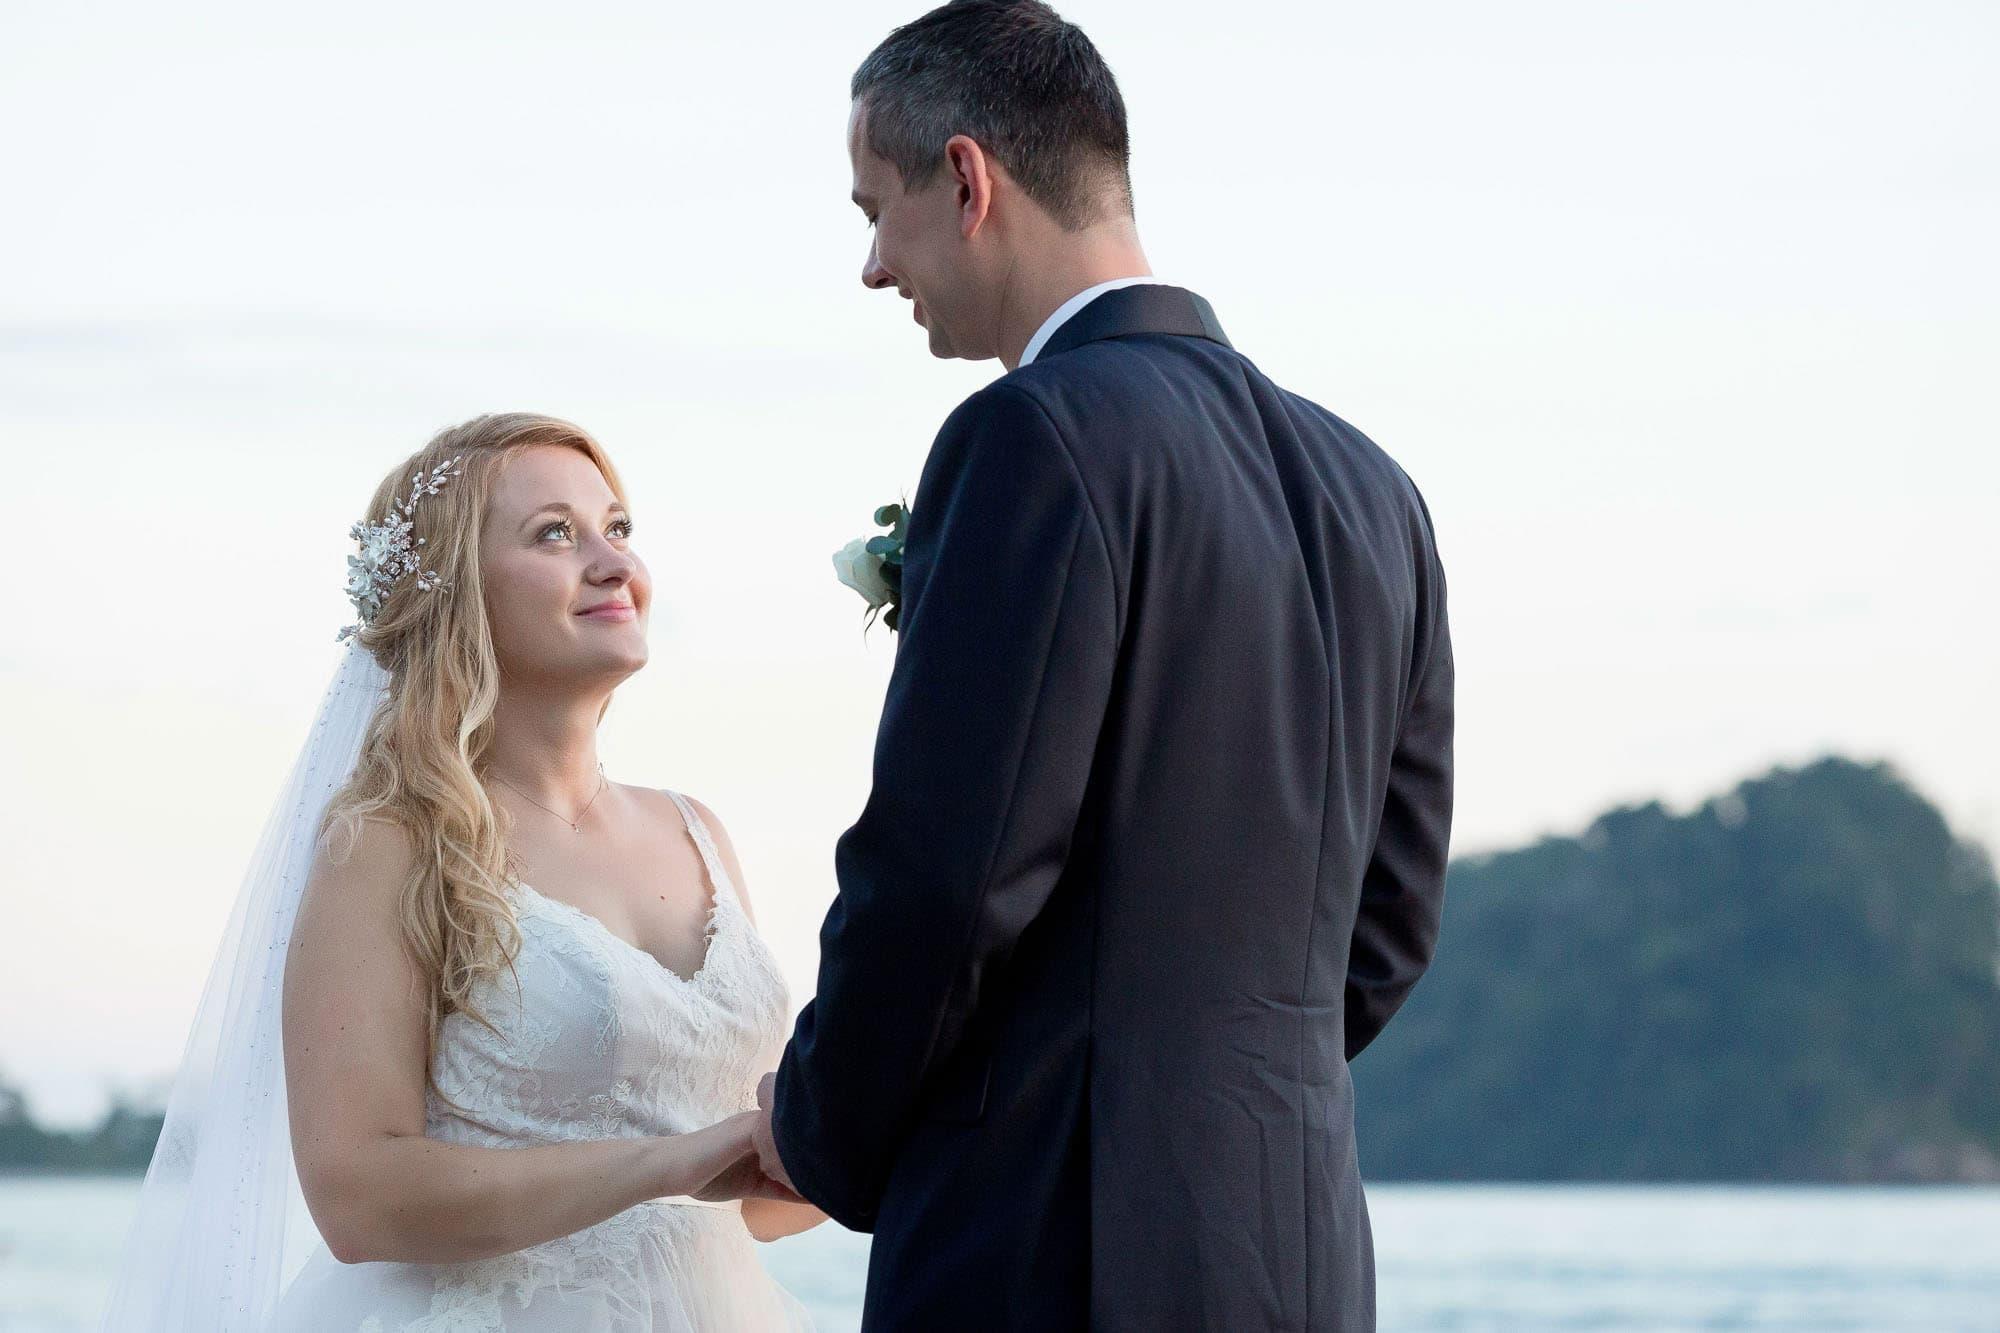 Traditional wedding portrait time!